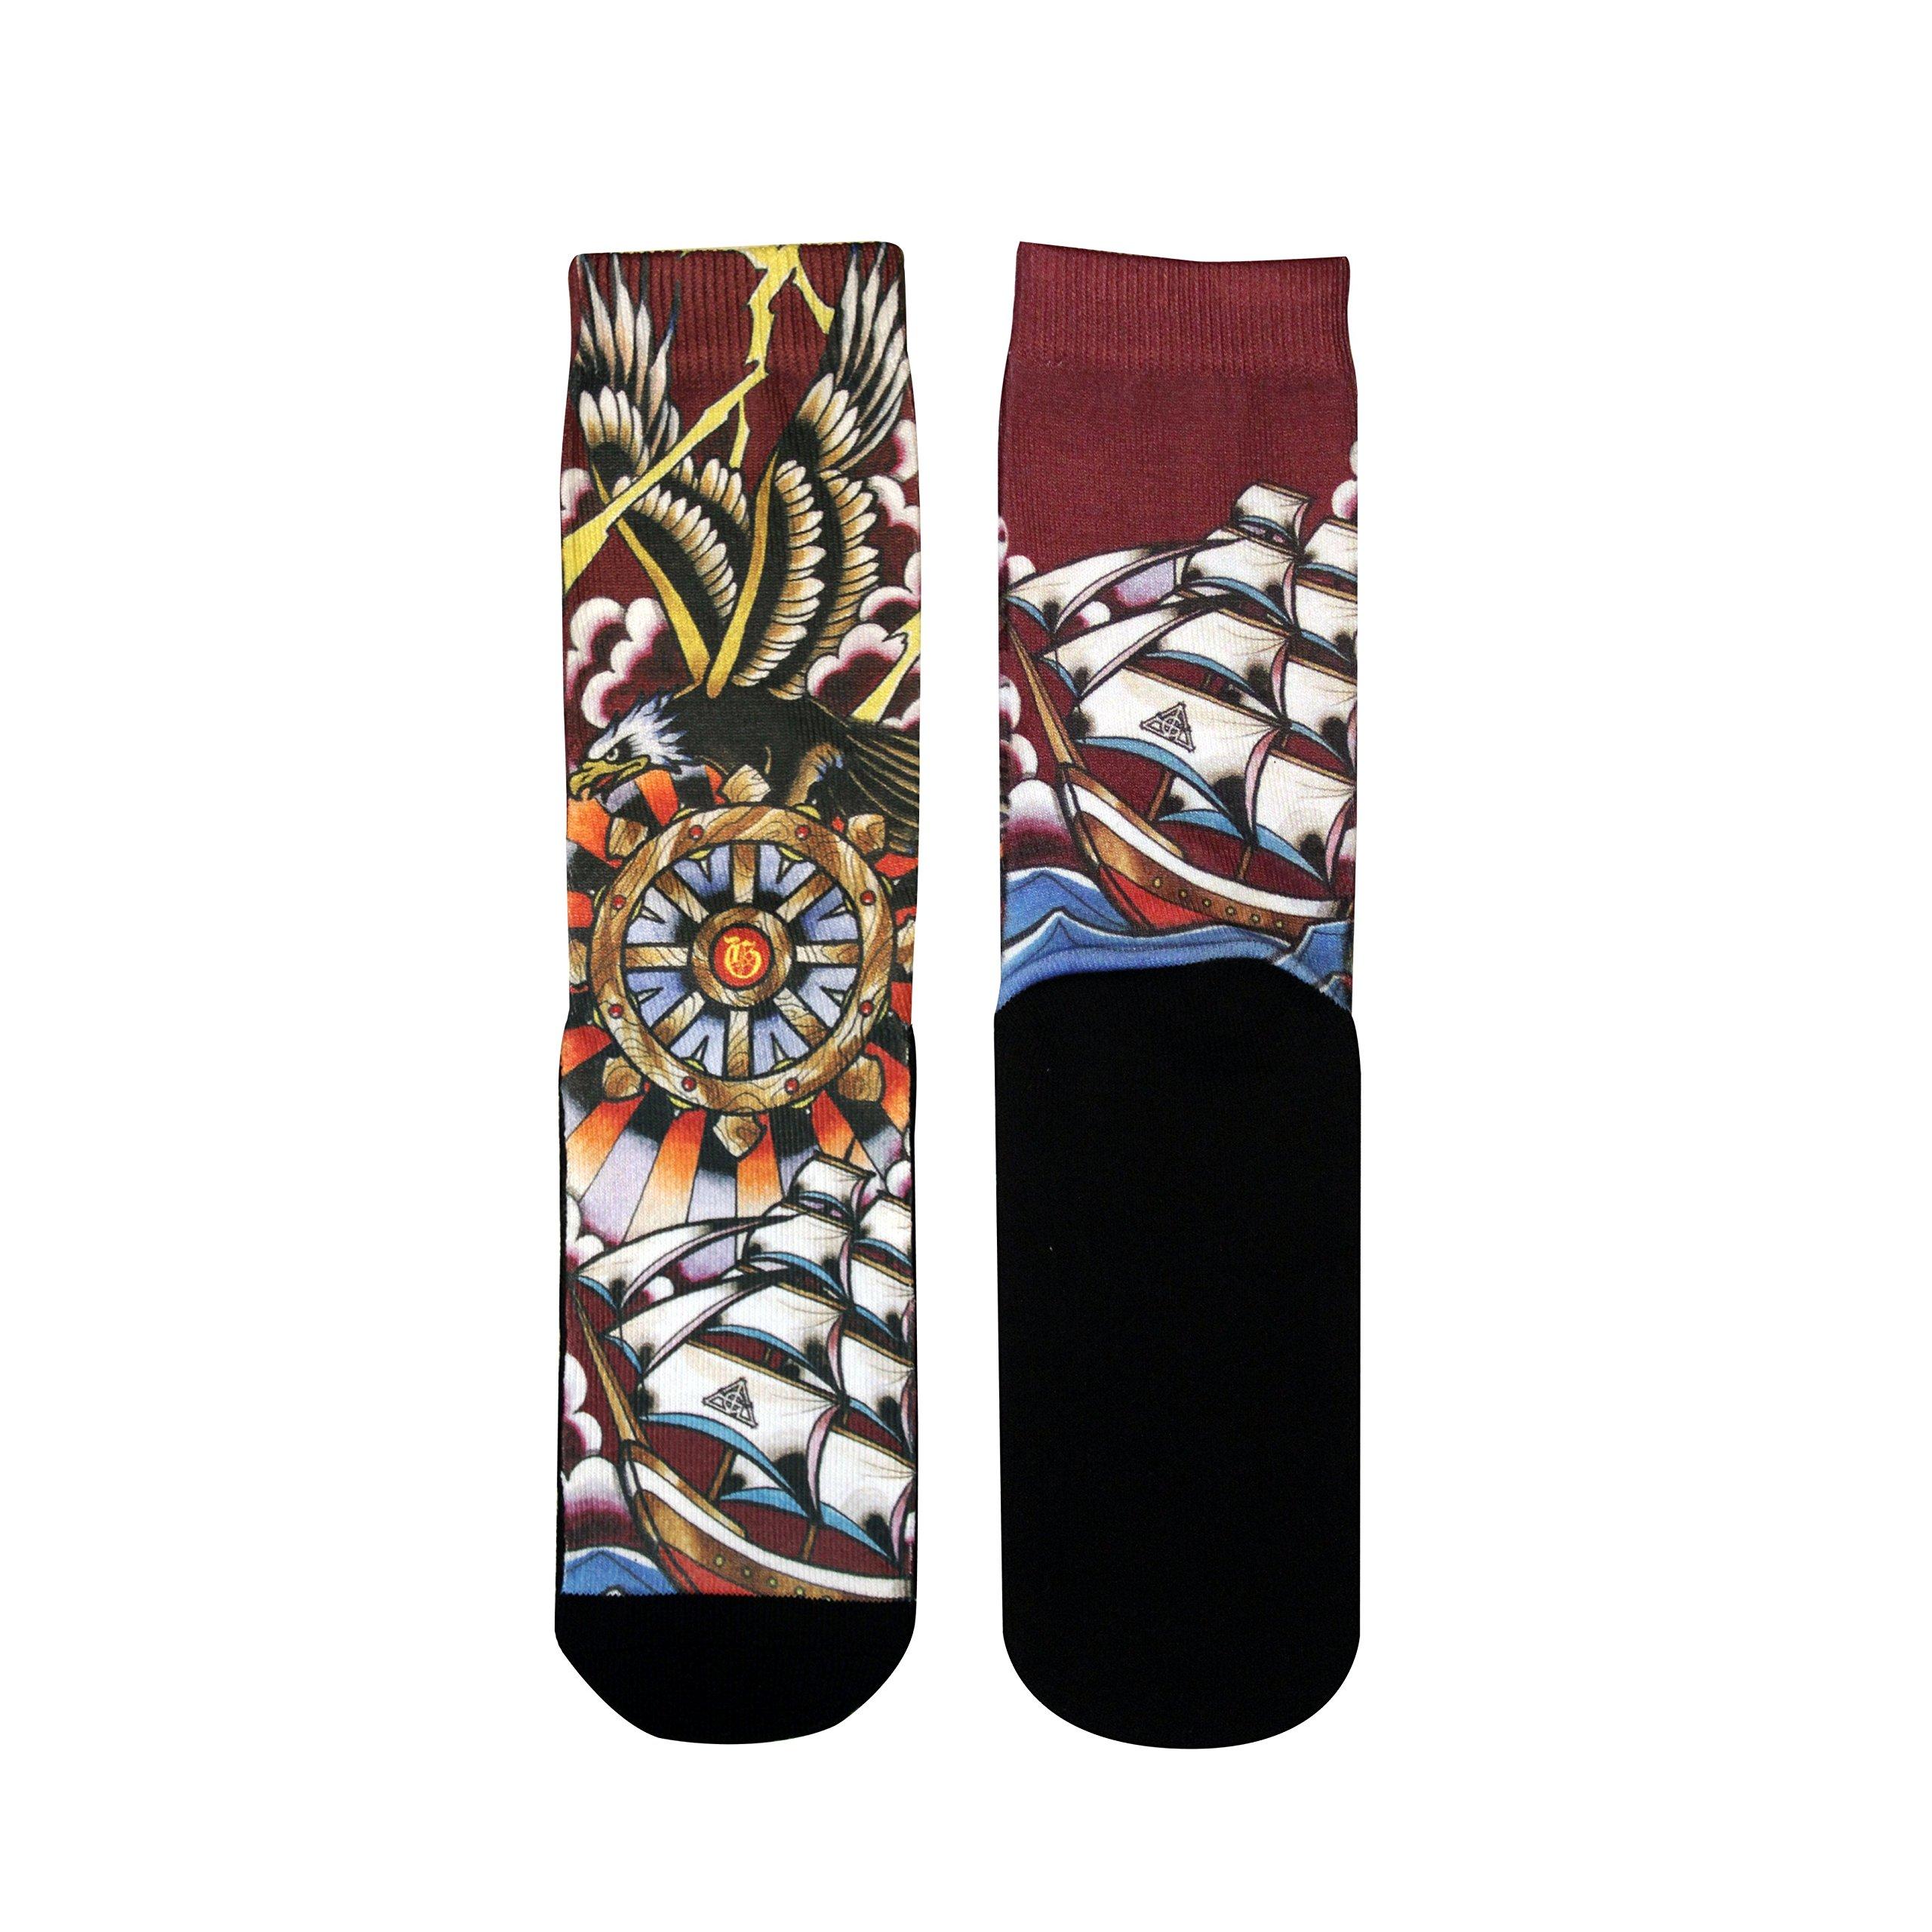 Custom Socks Elite Tattoo Art Collection Stance Fits 6-12 Gold ink (Eagle)